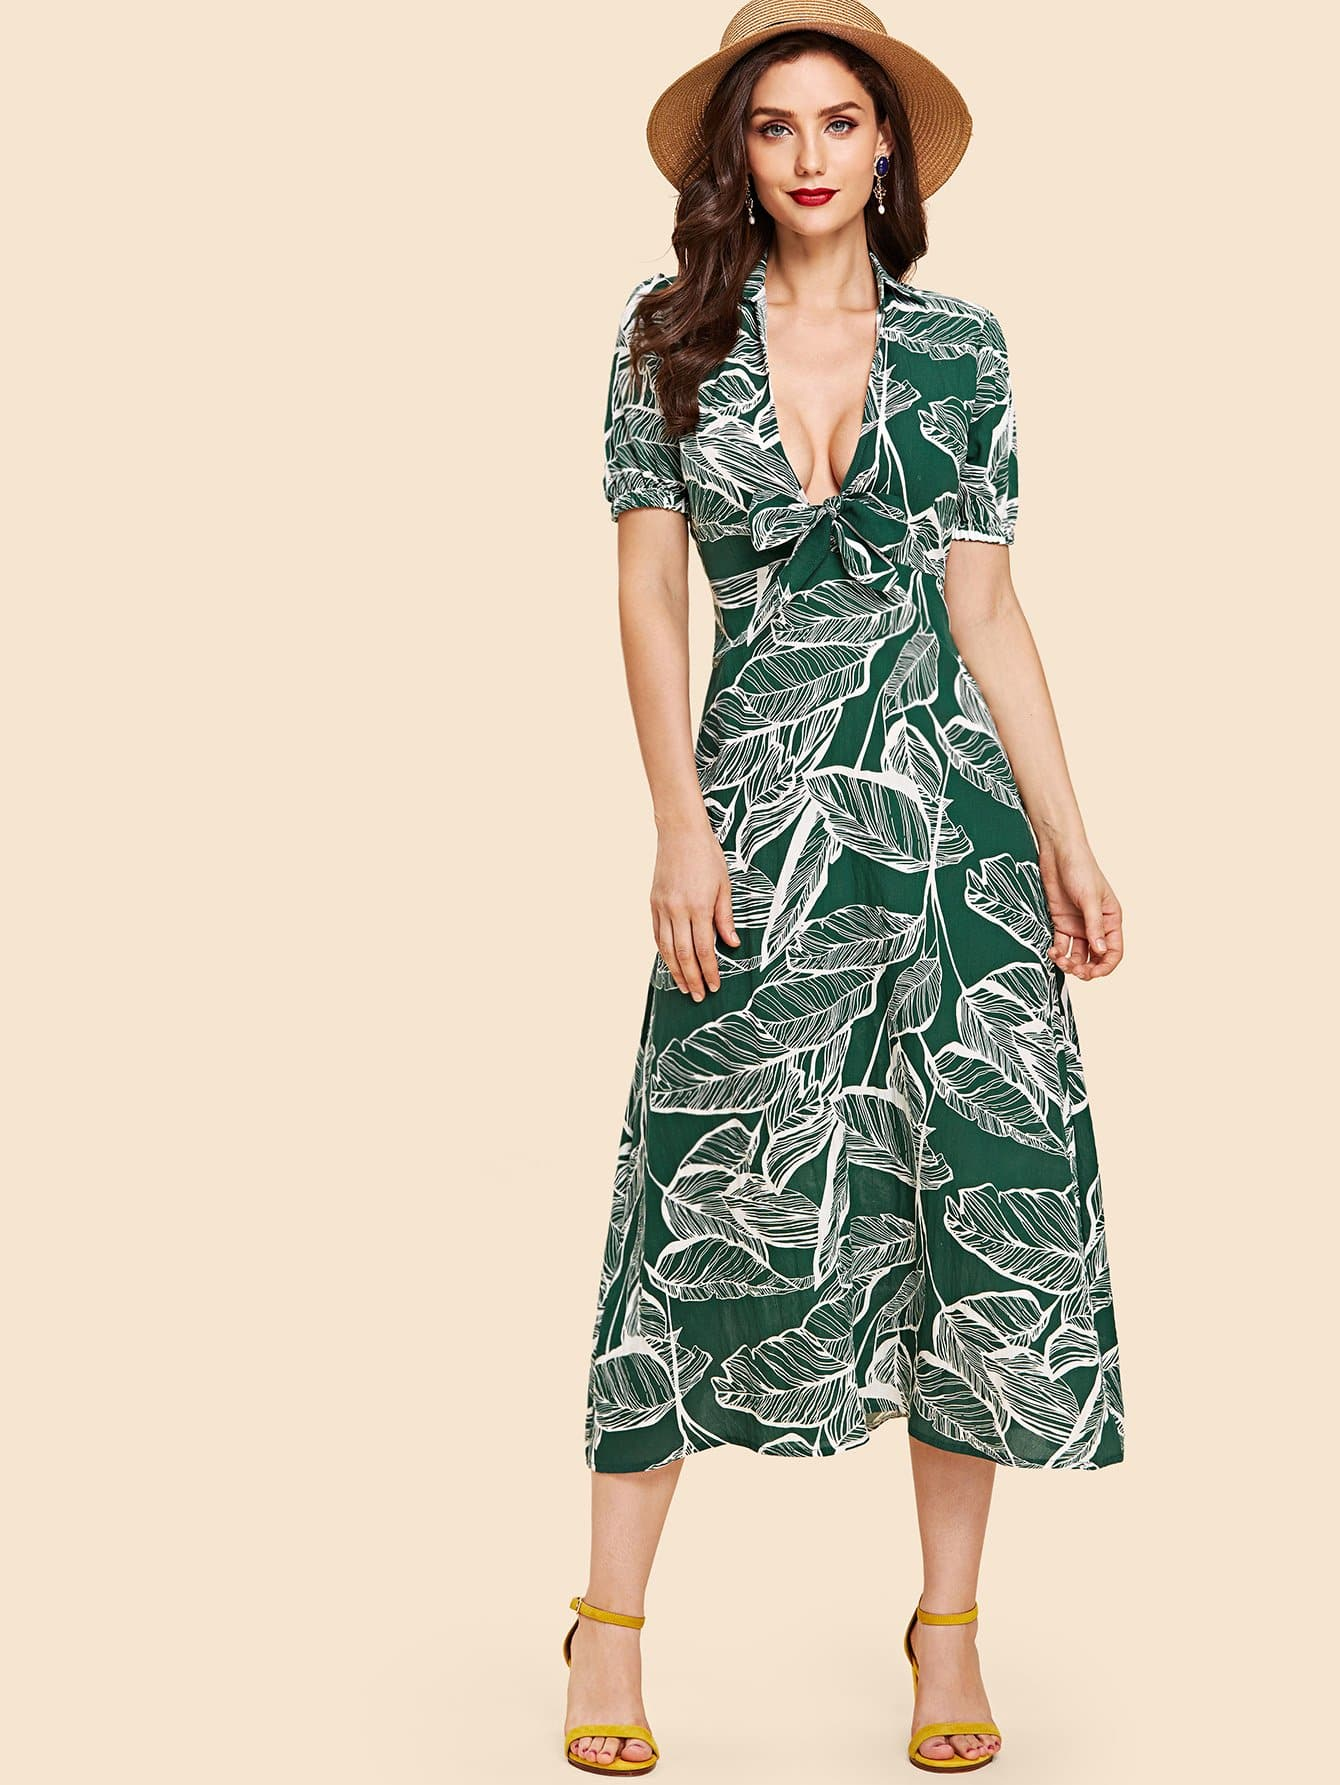 Palm Print Tie Neck Dress